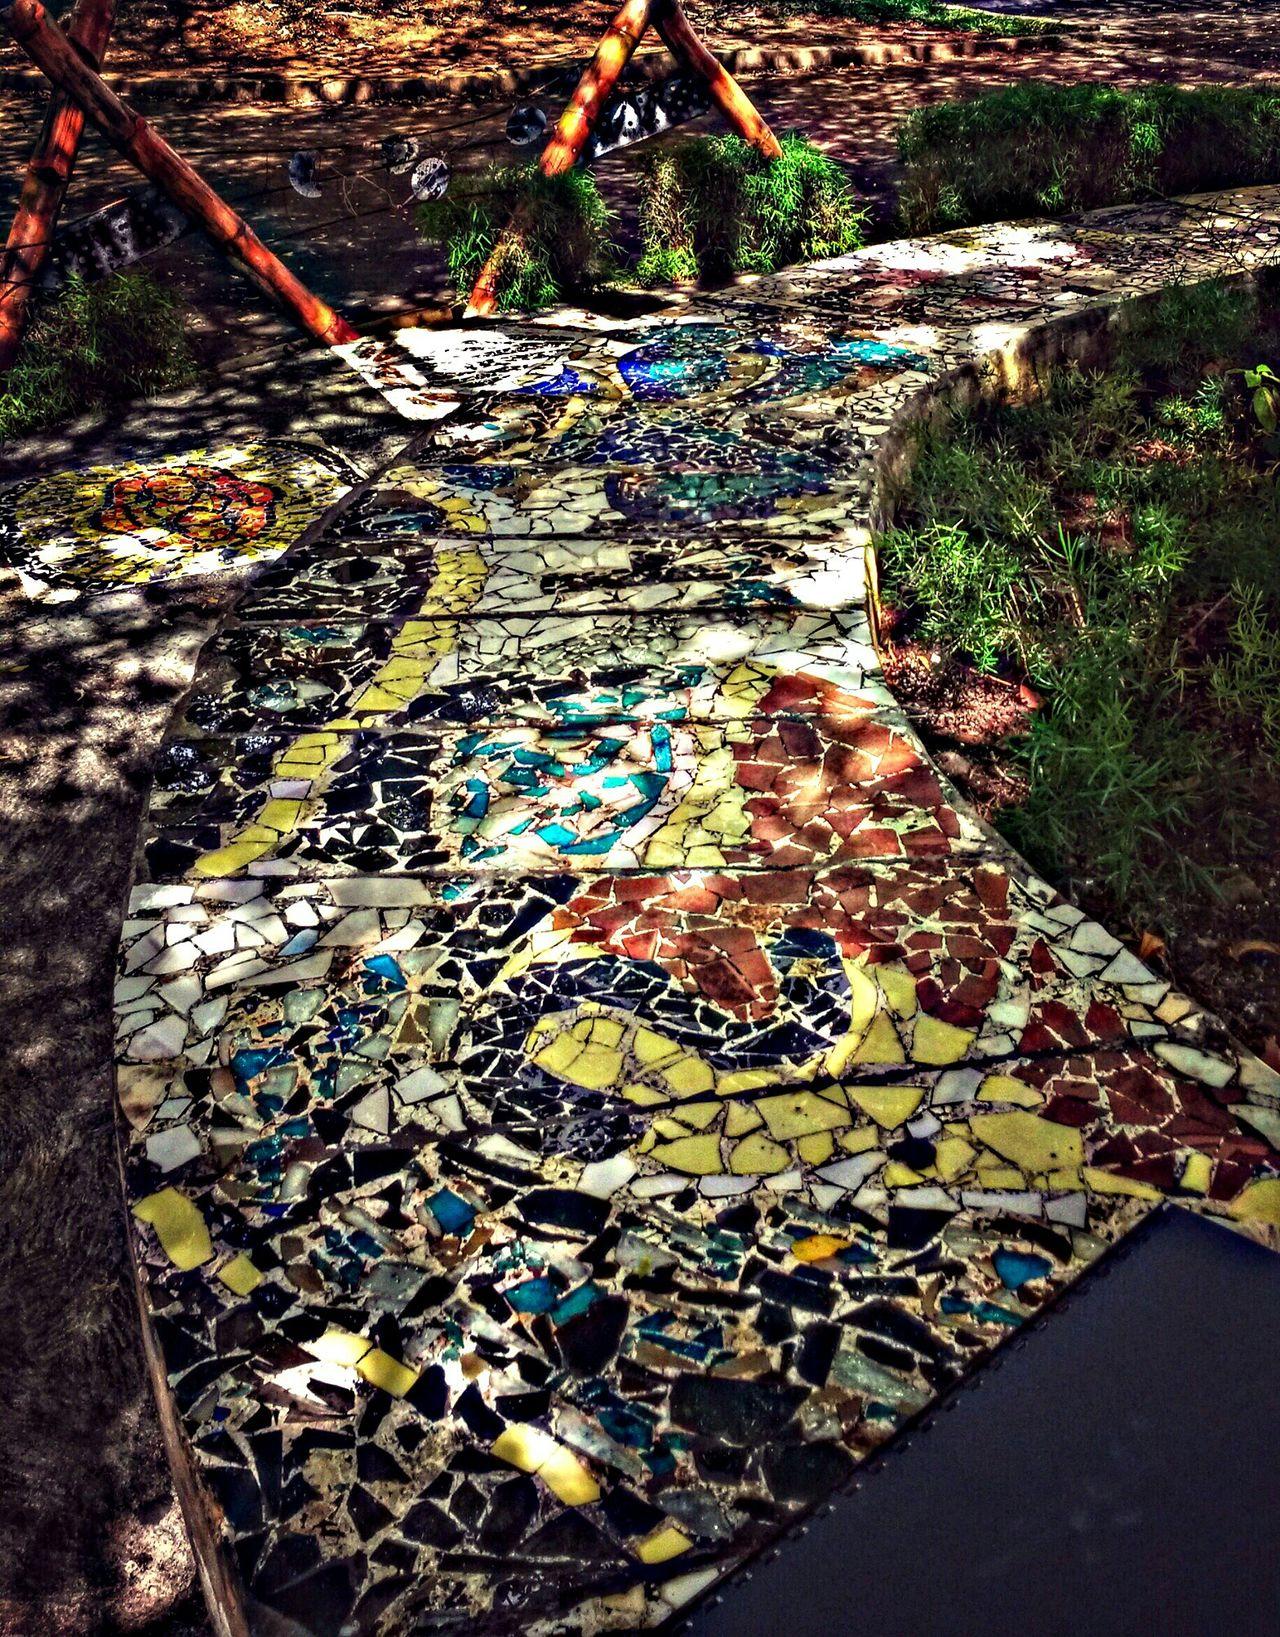 waiting Fdi Outdoors Mosaic Mosaicart Mosaic Tiles Bench Tree Shade Soaking Up The Sun